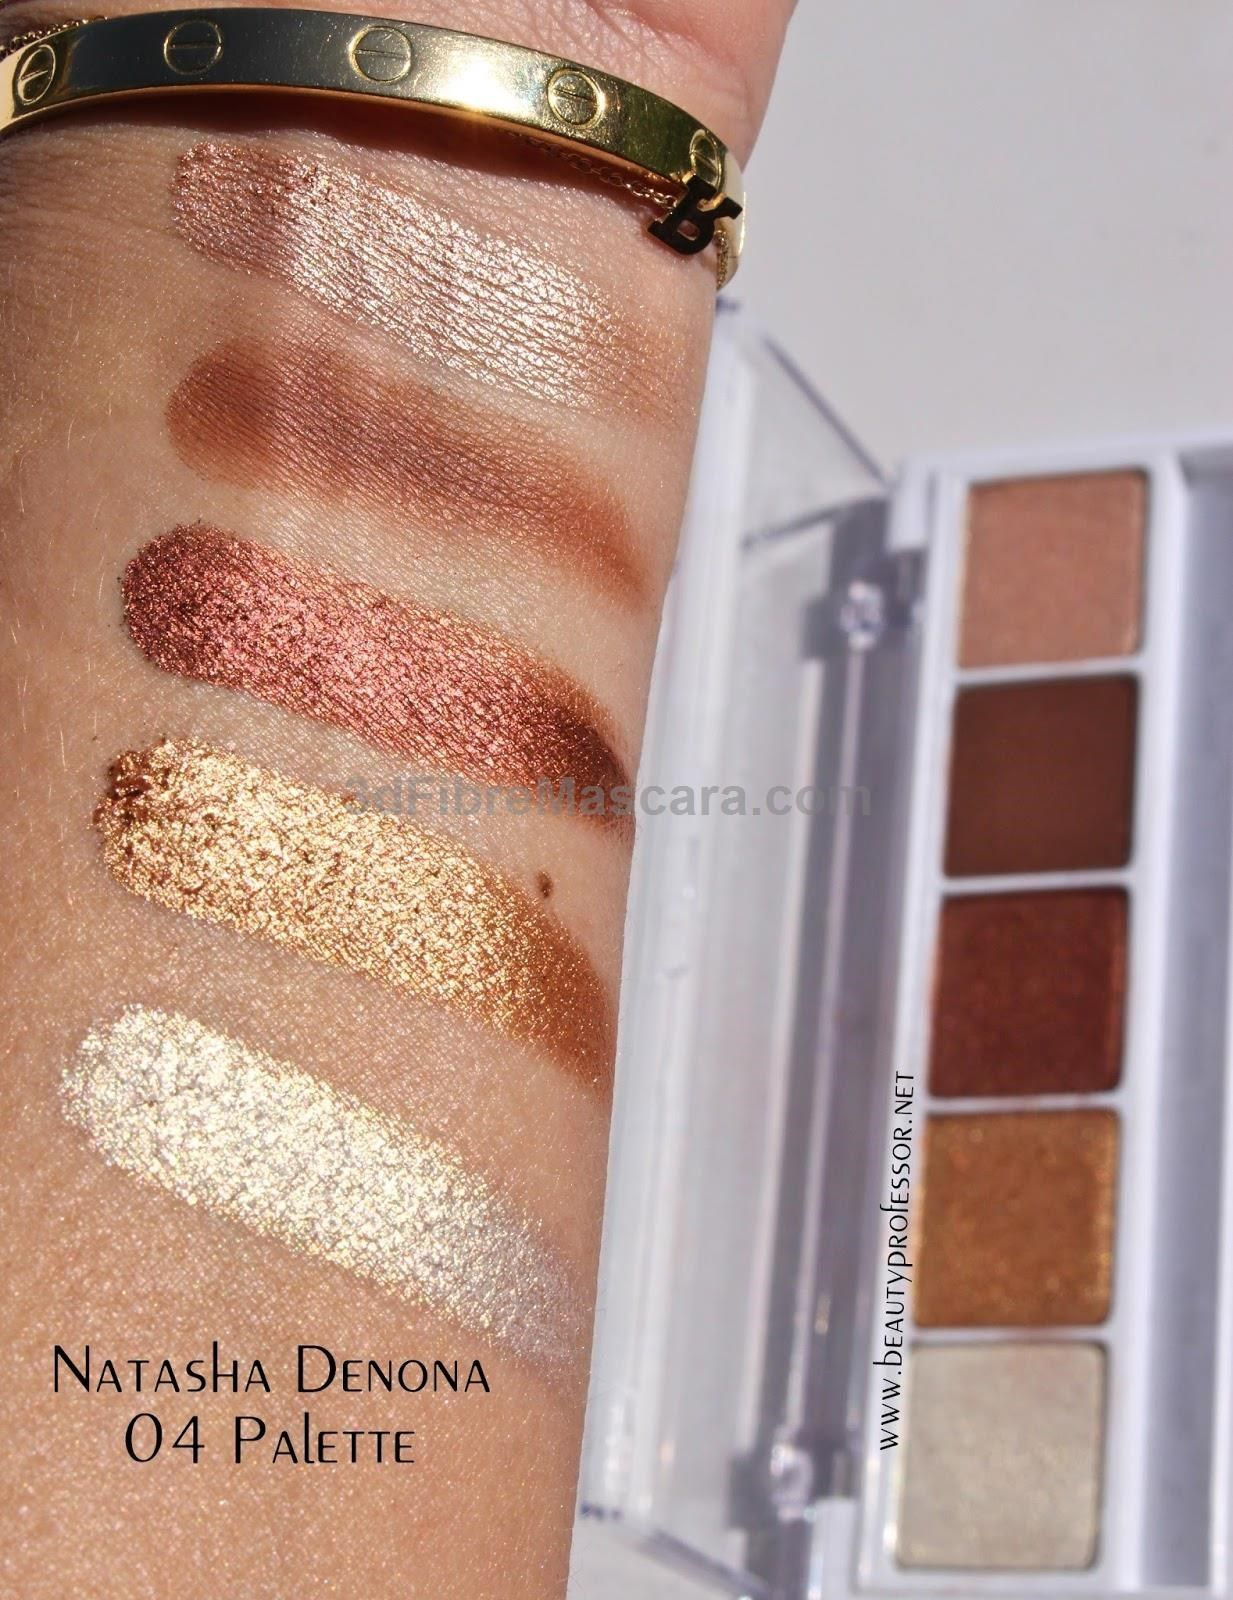 Mini Nude Eyeshadow Palette by Natasha Denona #13